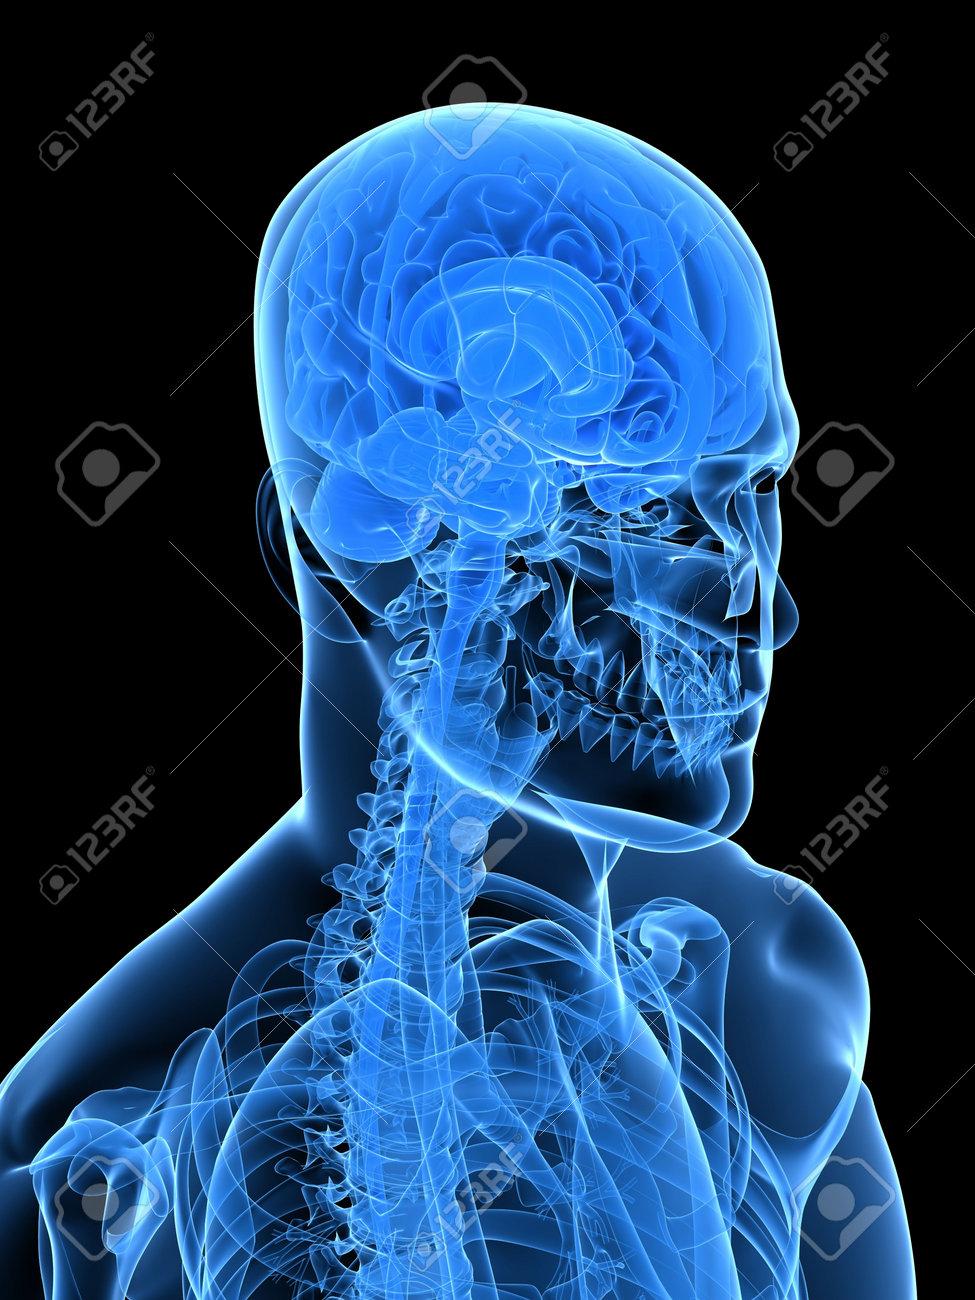 x-ray human head with brain Stock Photo - 5960170